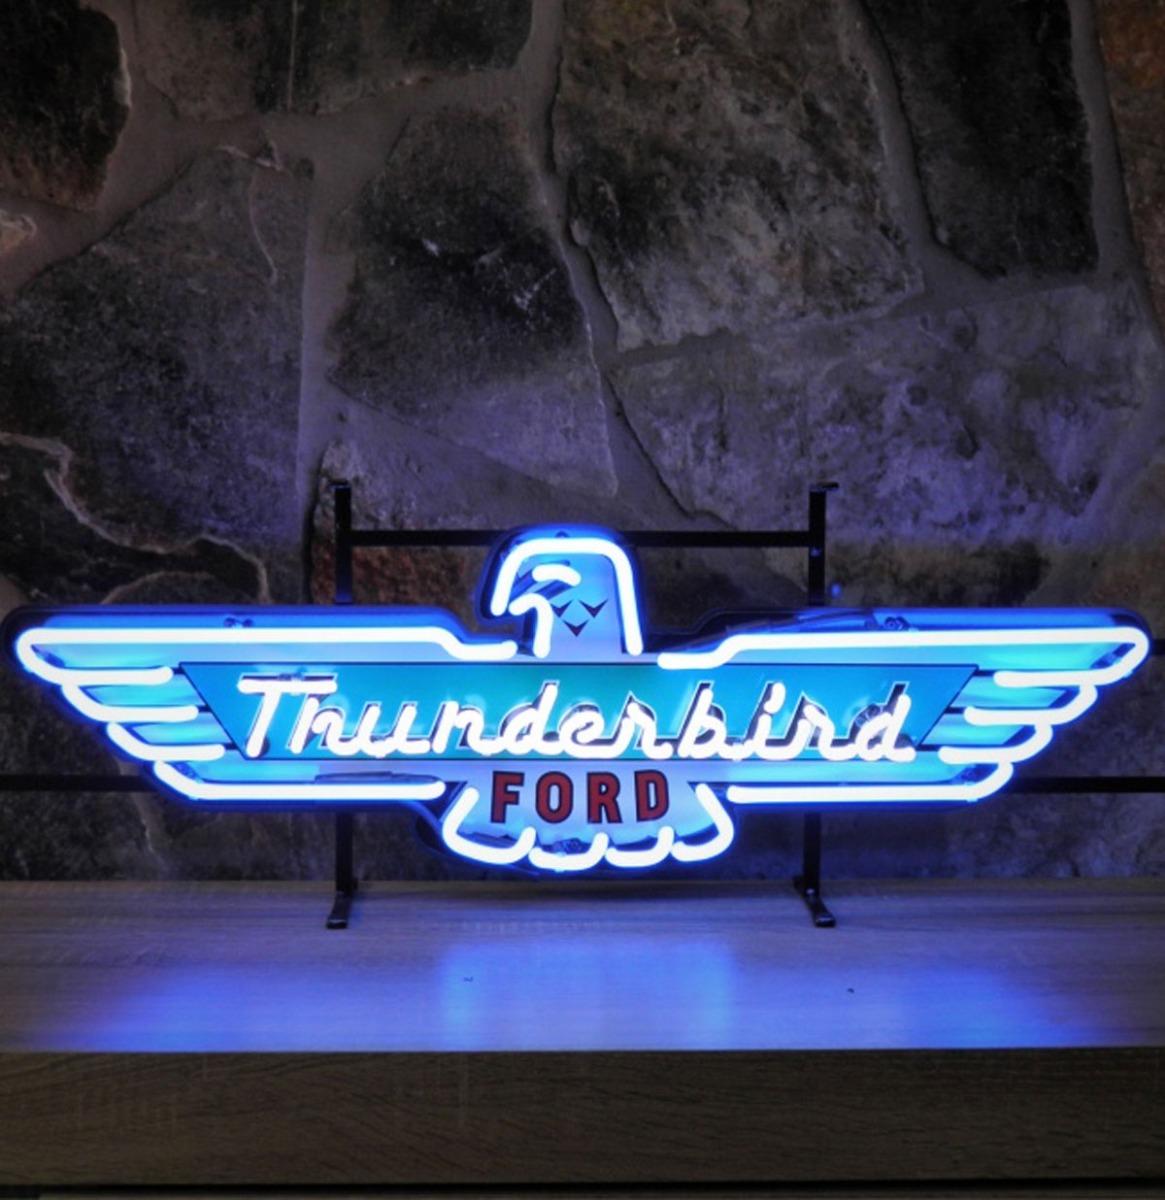 Ford Thunderbird Logo Neon Verlichting Met Achterplaat 88 x 28 cm